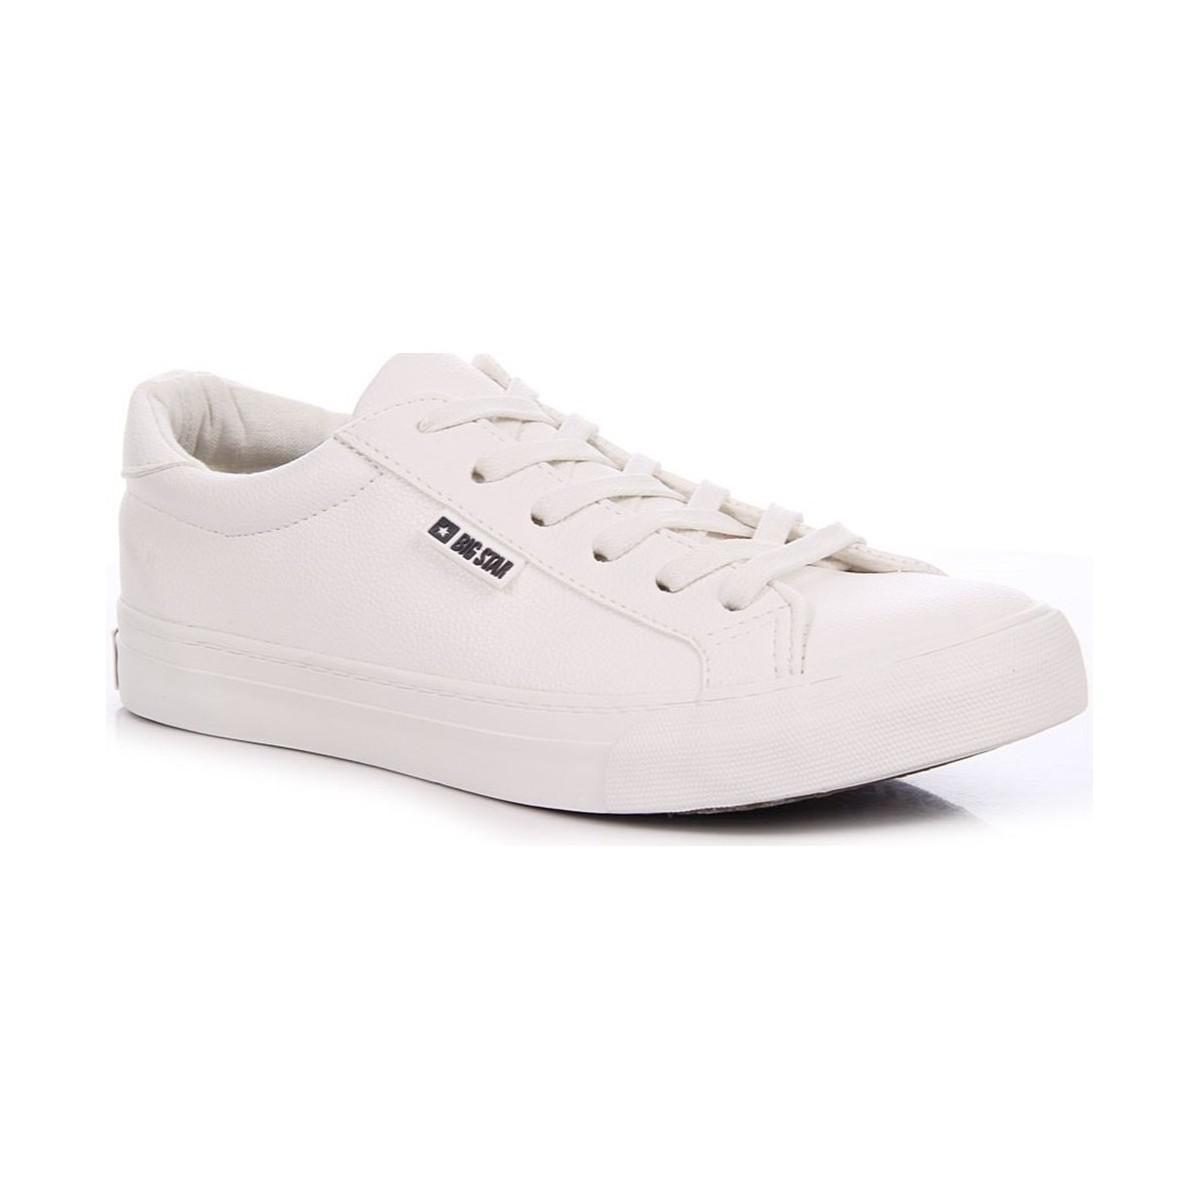 Tenis Big Star - Y274128 White 9LLoOx